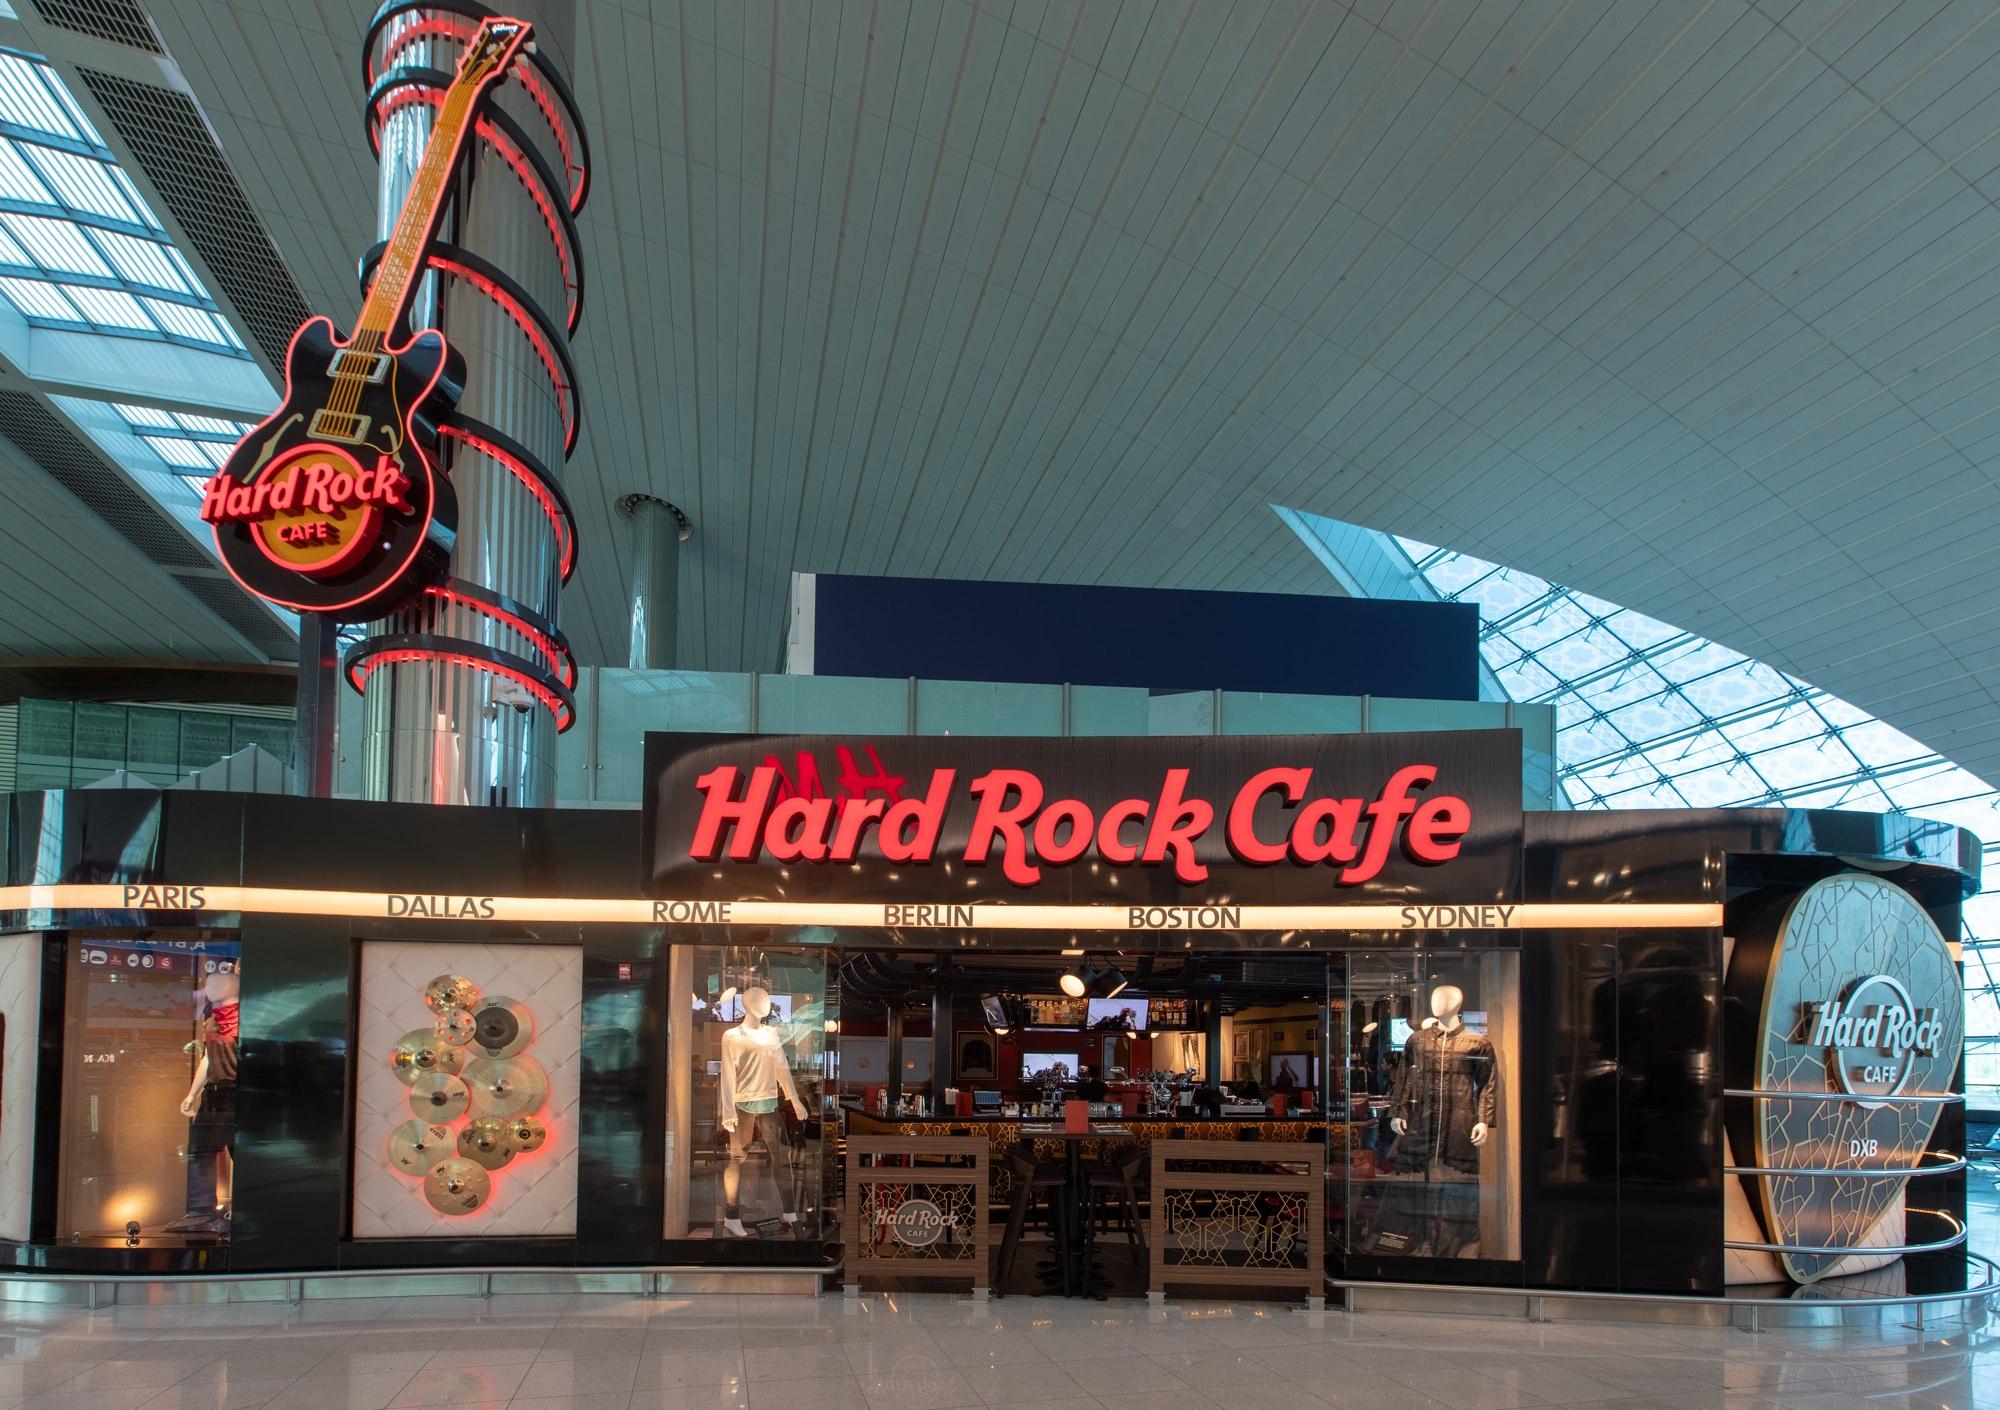 hardrock-cafe-dubai12018-11-17-05-54-15